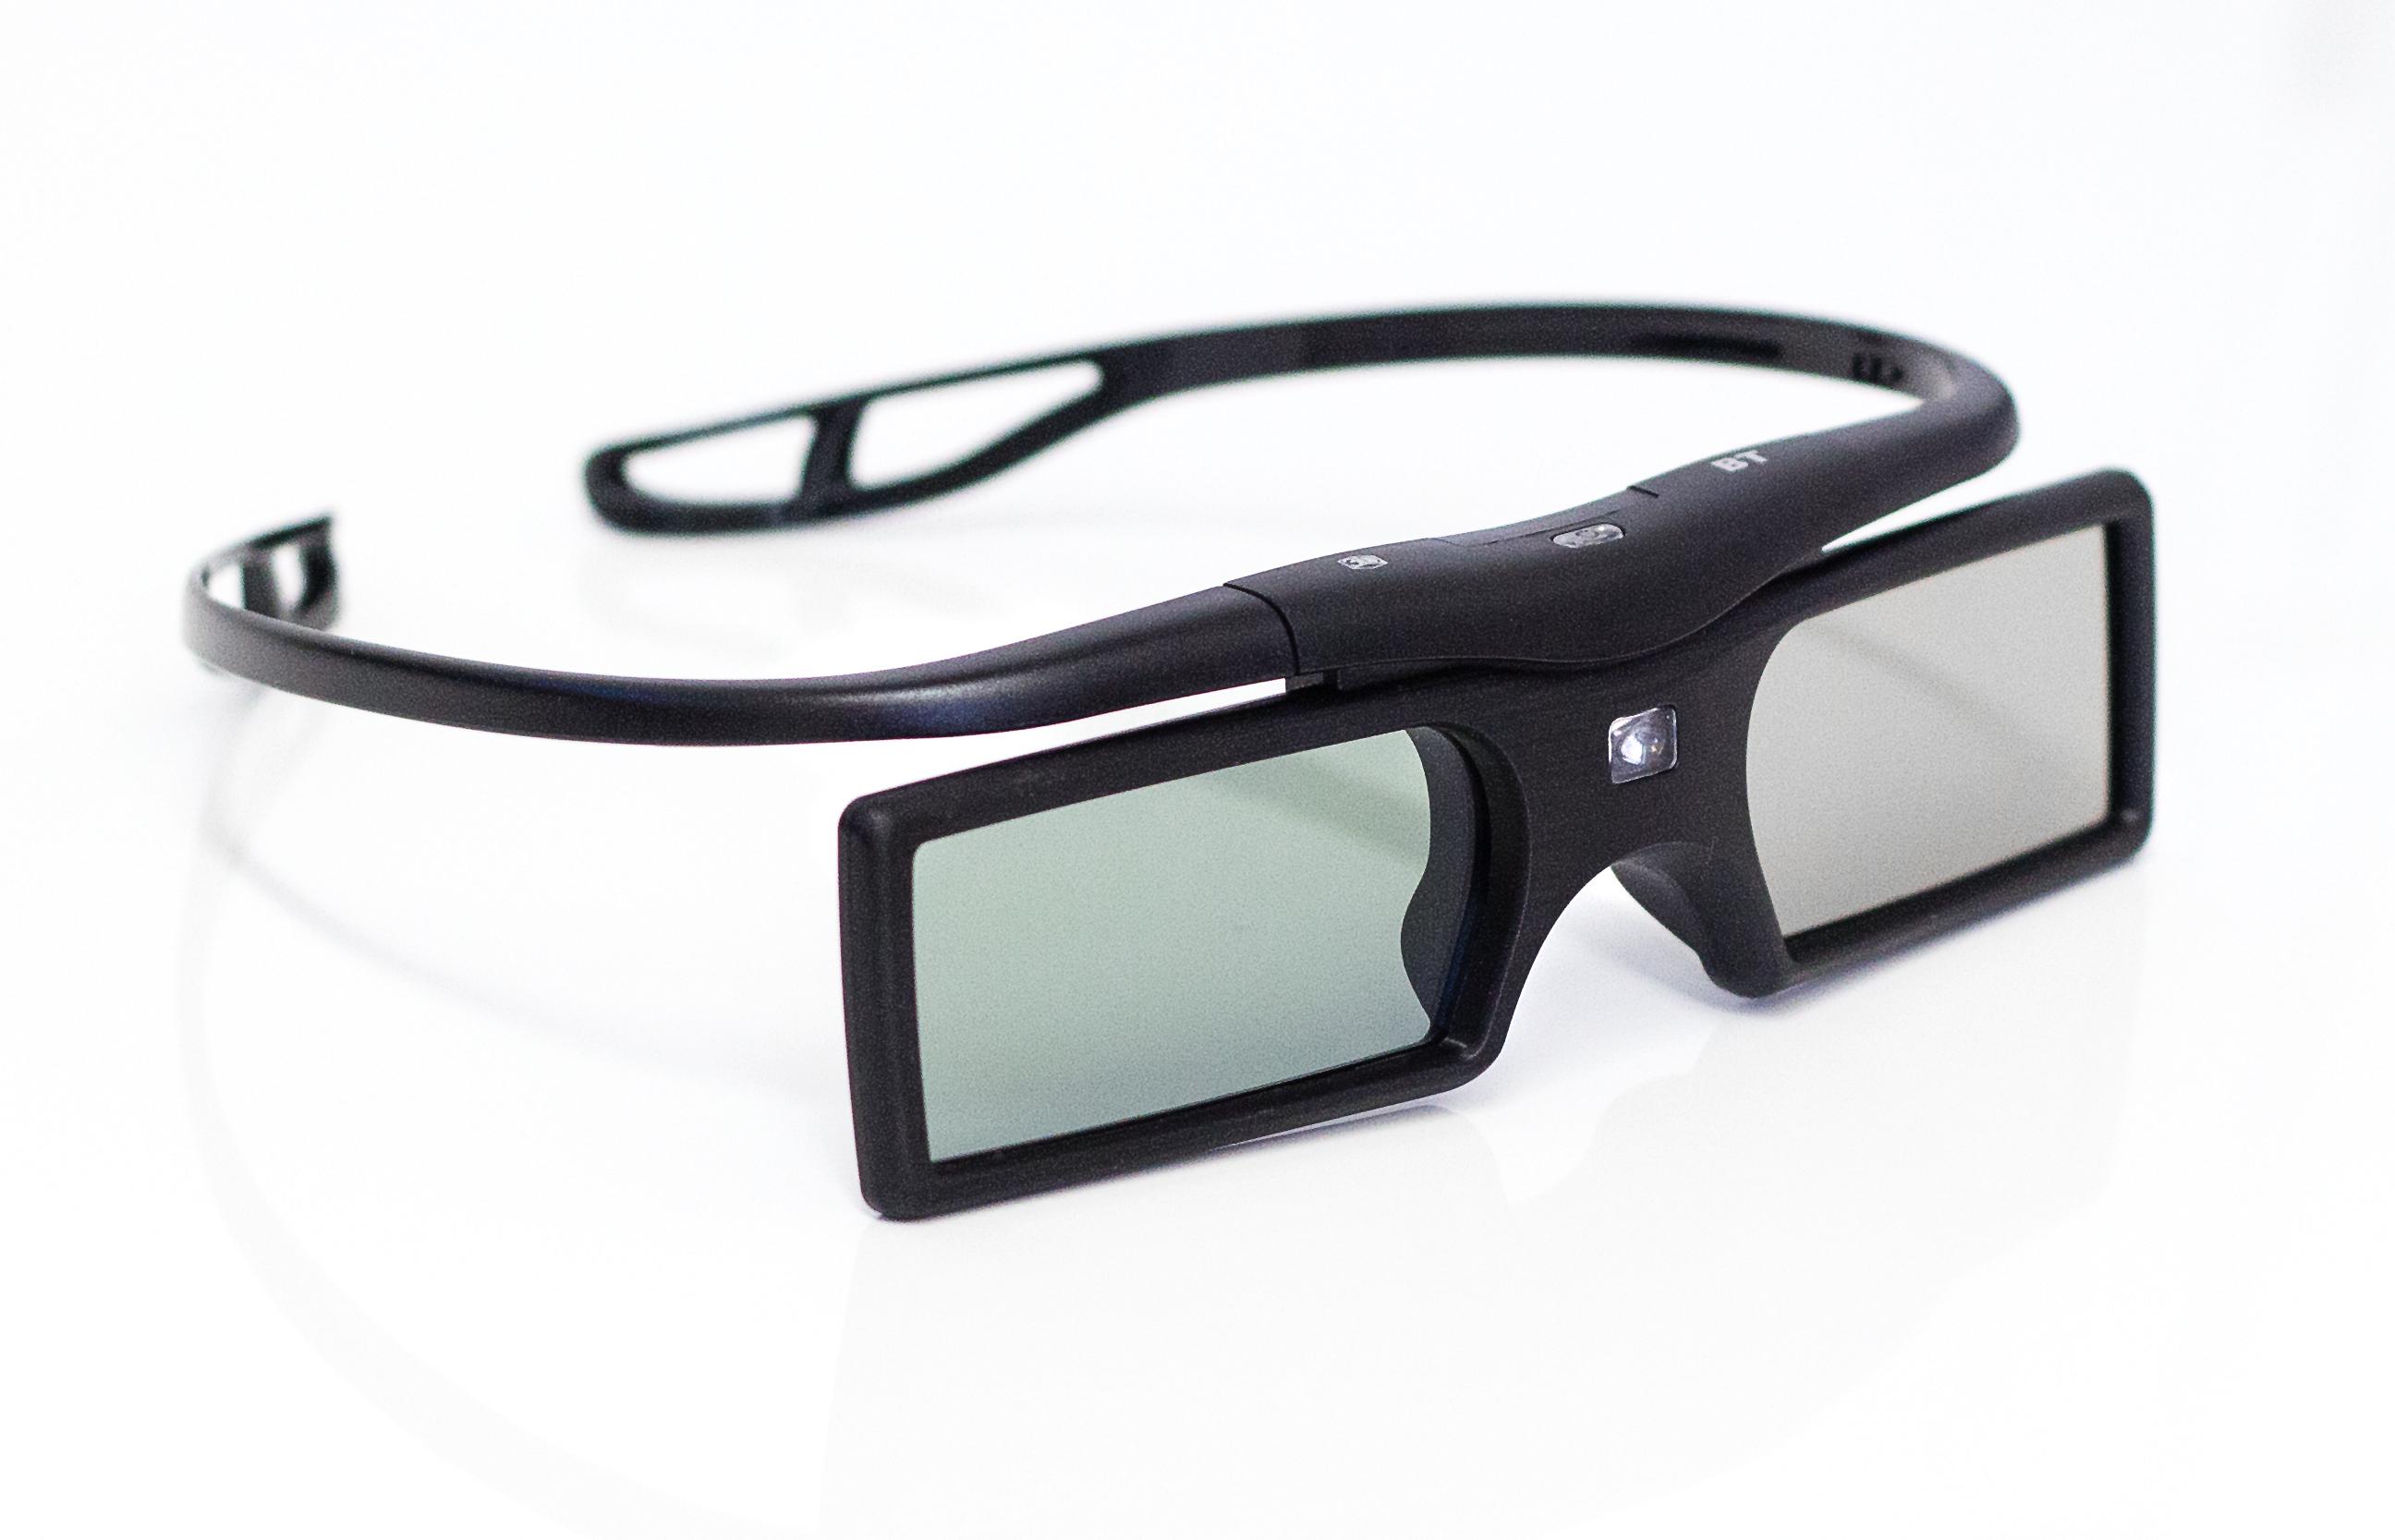 precorn onlineshop 3d active shutter 3d brille batteriebetrieb in schwarz f r bluetooth 3d. Black Bedroom Furniture Sets. Home Design Ideas